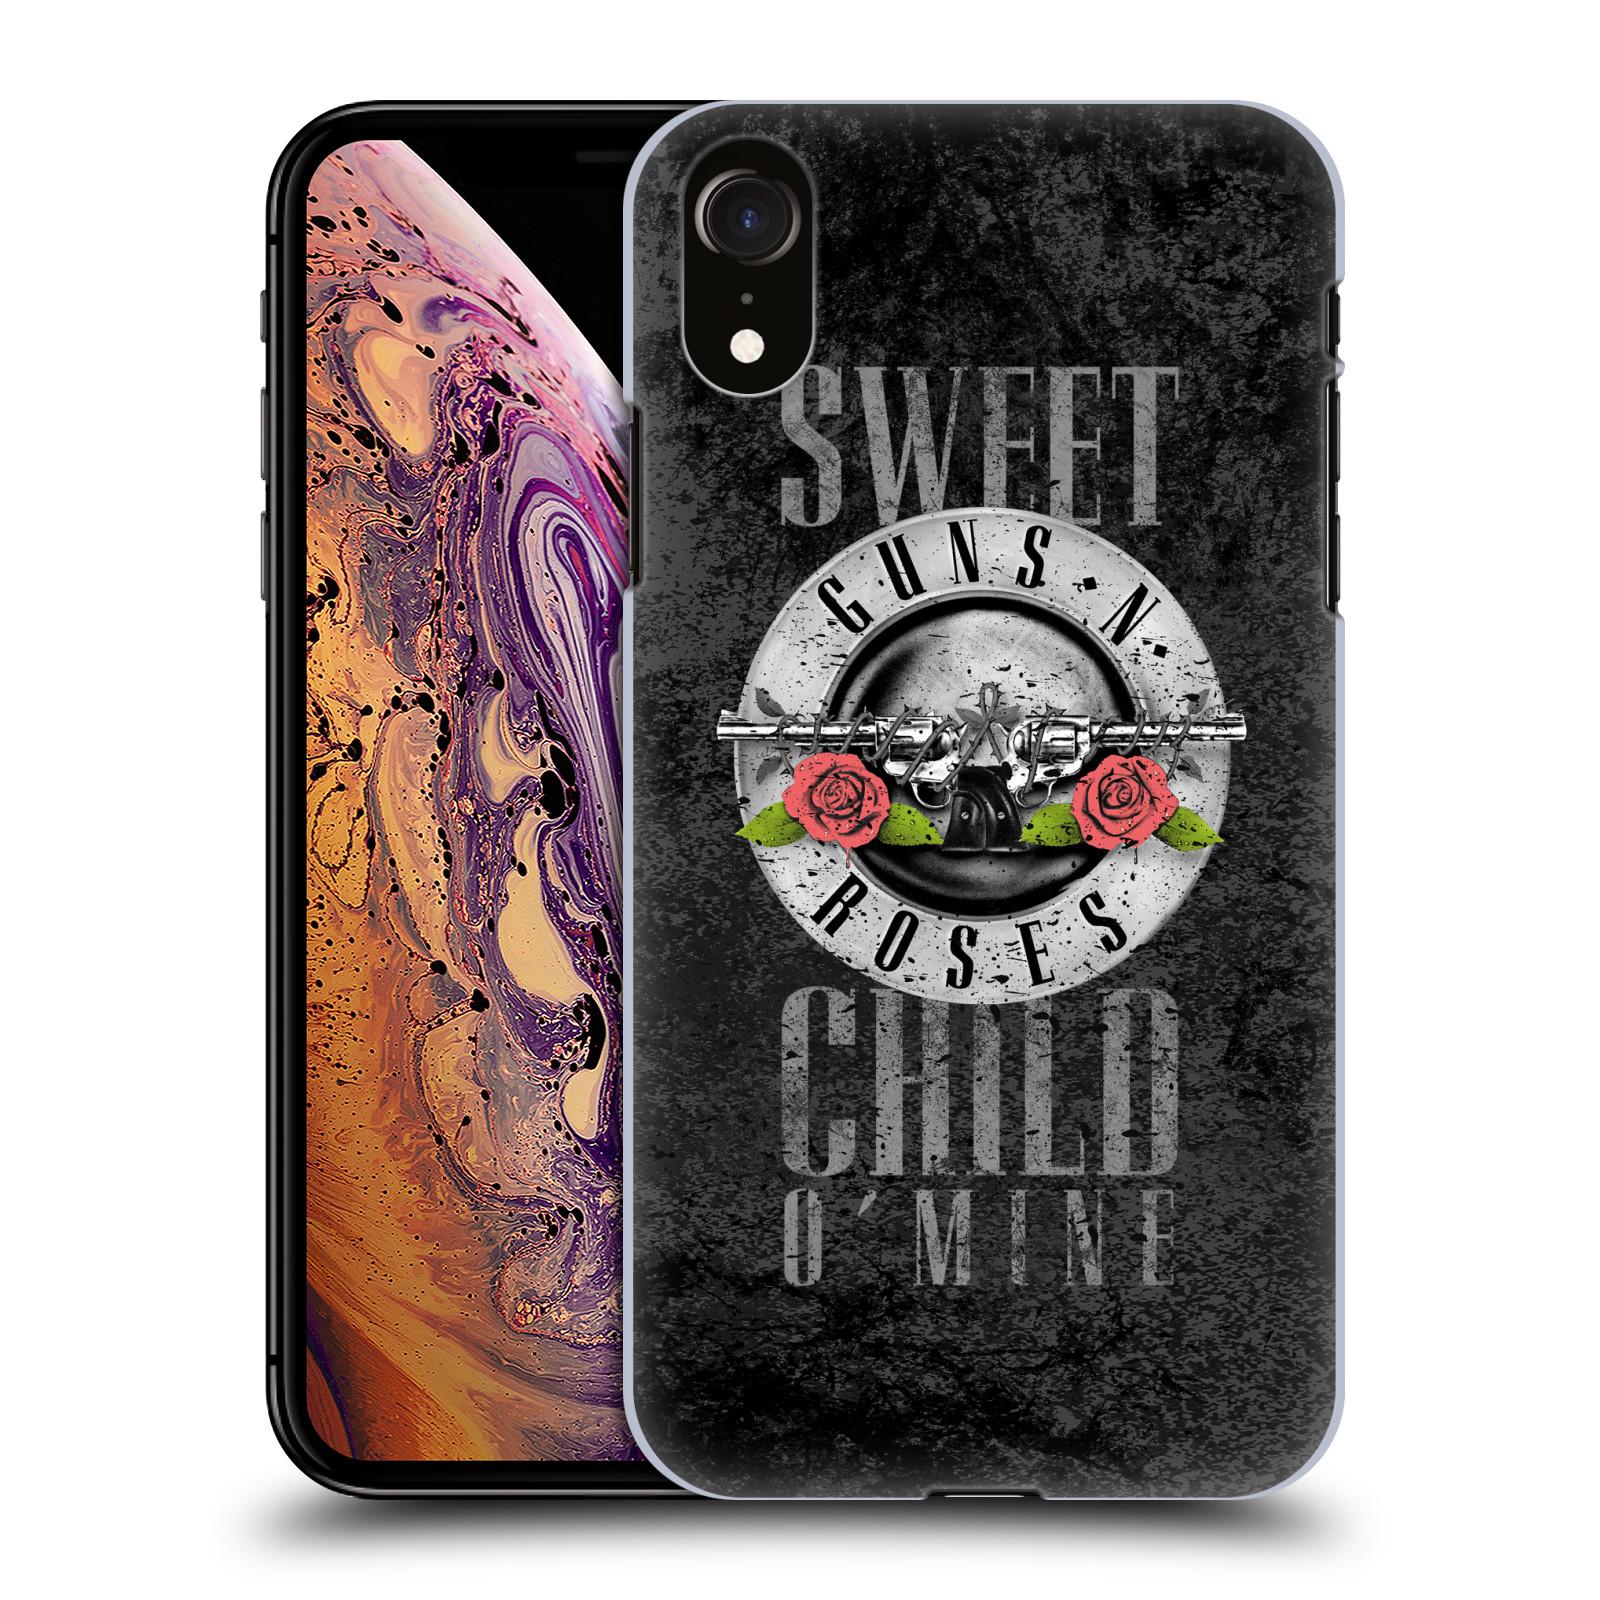 Plastové pouzdro na mobil Apple iPhone XR - Head Case - Guns N' Roses - Sweet Child